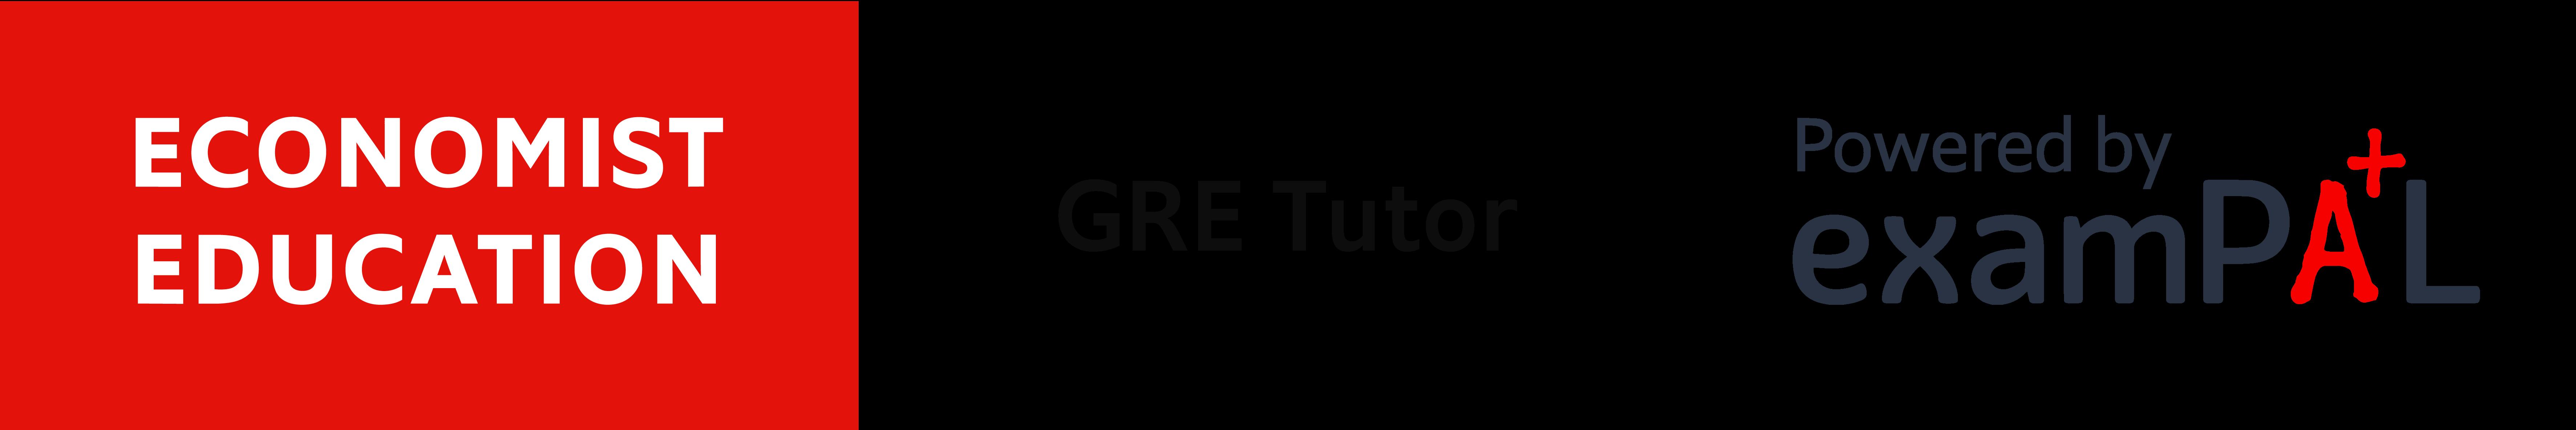 GRE Course & GMAT Course